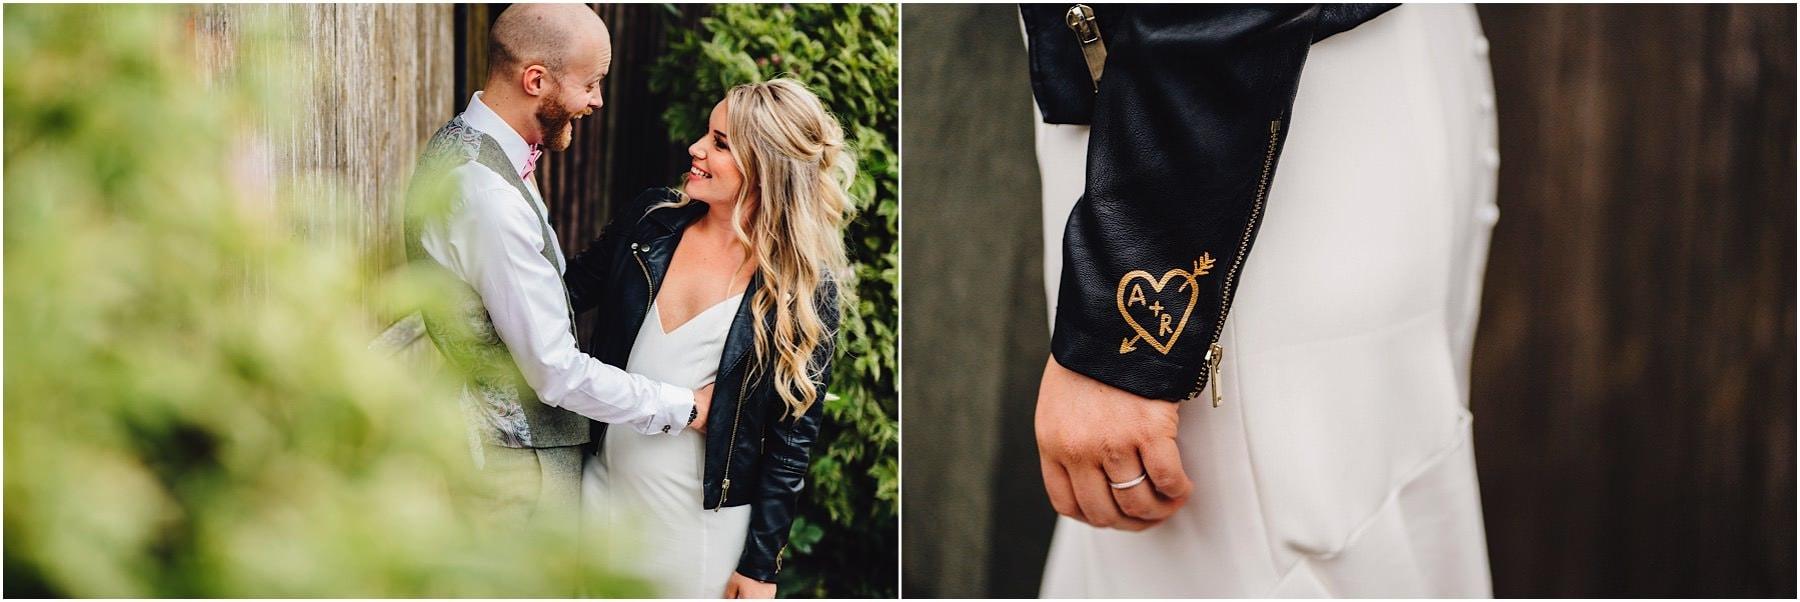 bride showing off her jacket